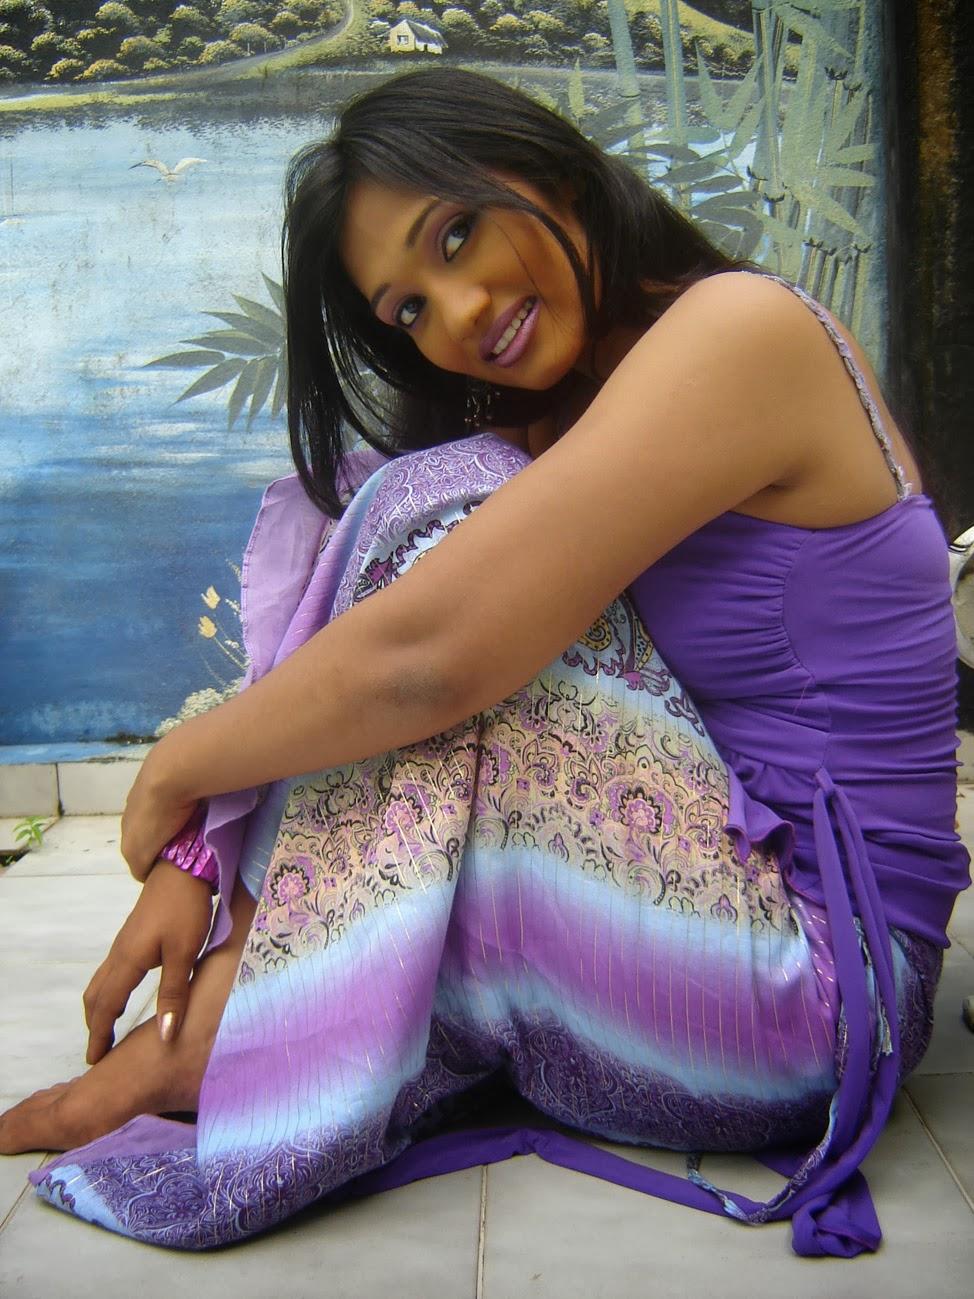 Sri Lankan Girls|Ceylon Hot Ladies|Lanka Sexy Girl: Sep 16